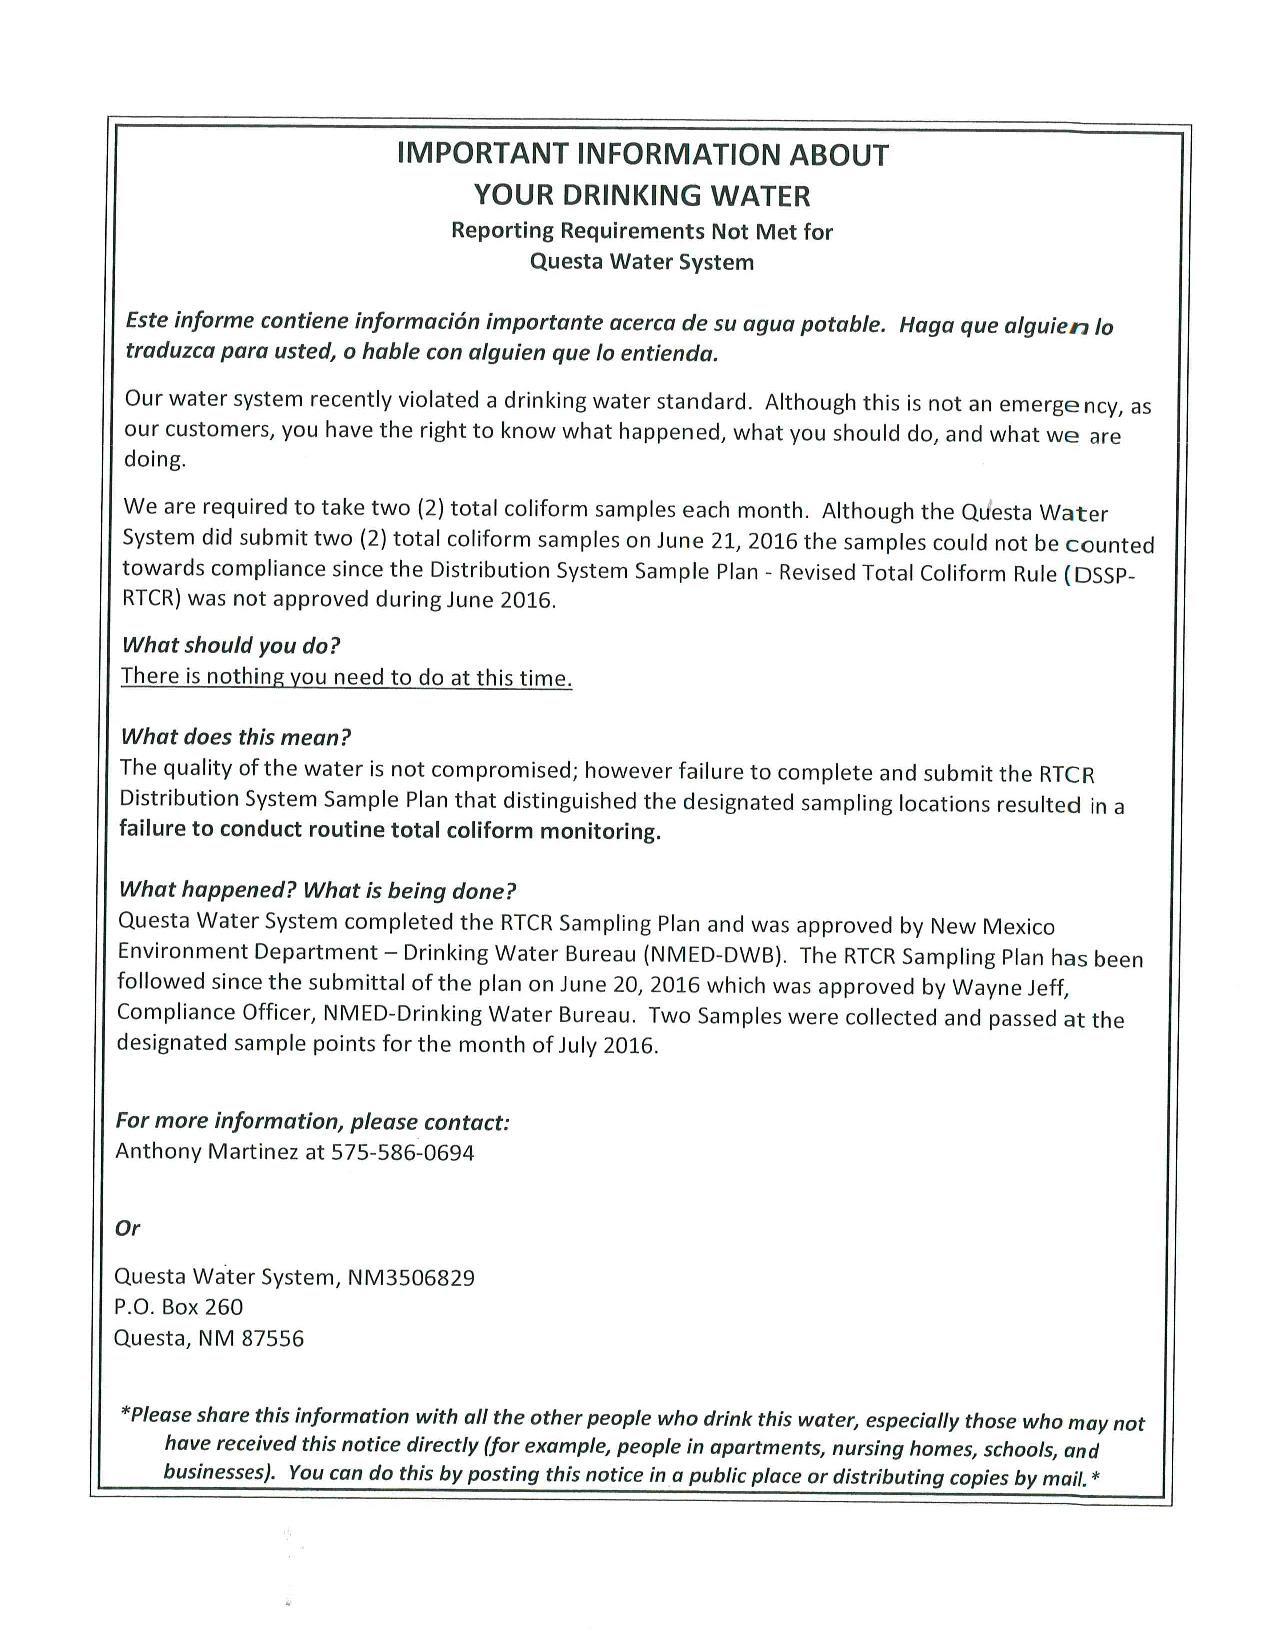 Kelebihan dan kelemahan essay test Questa New Mexico